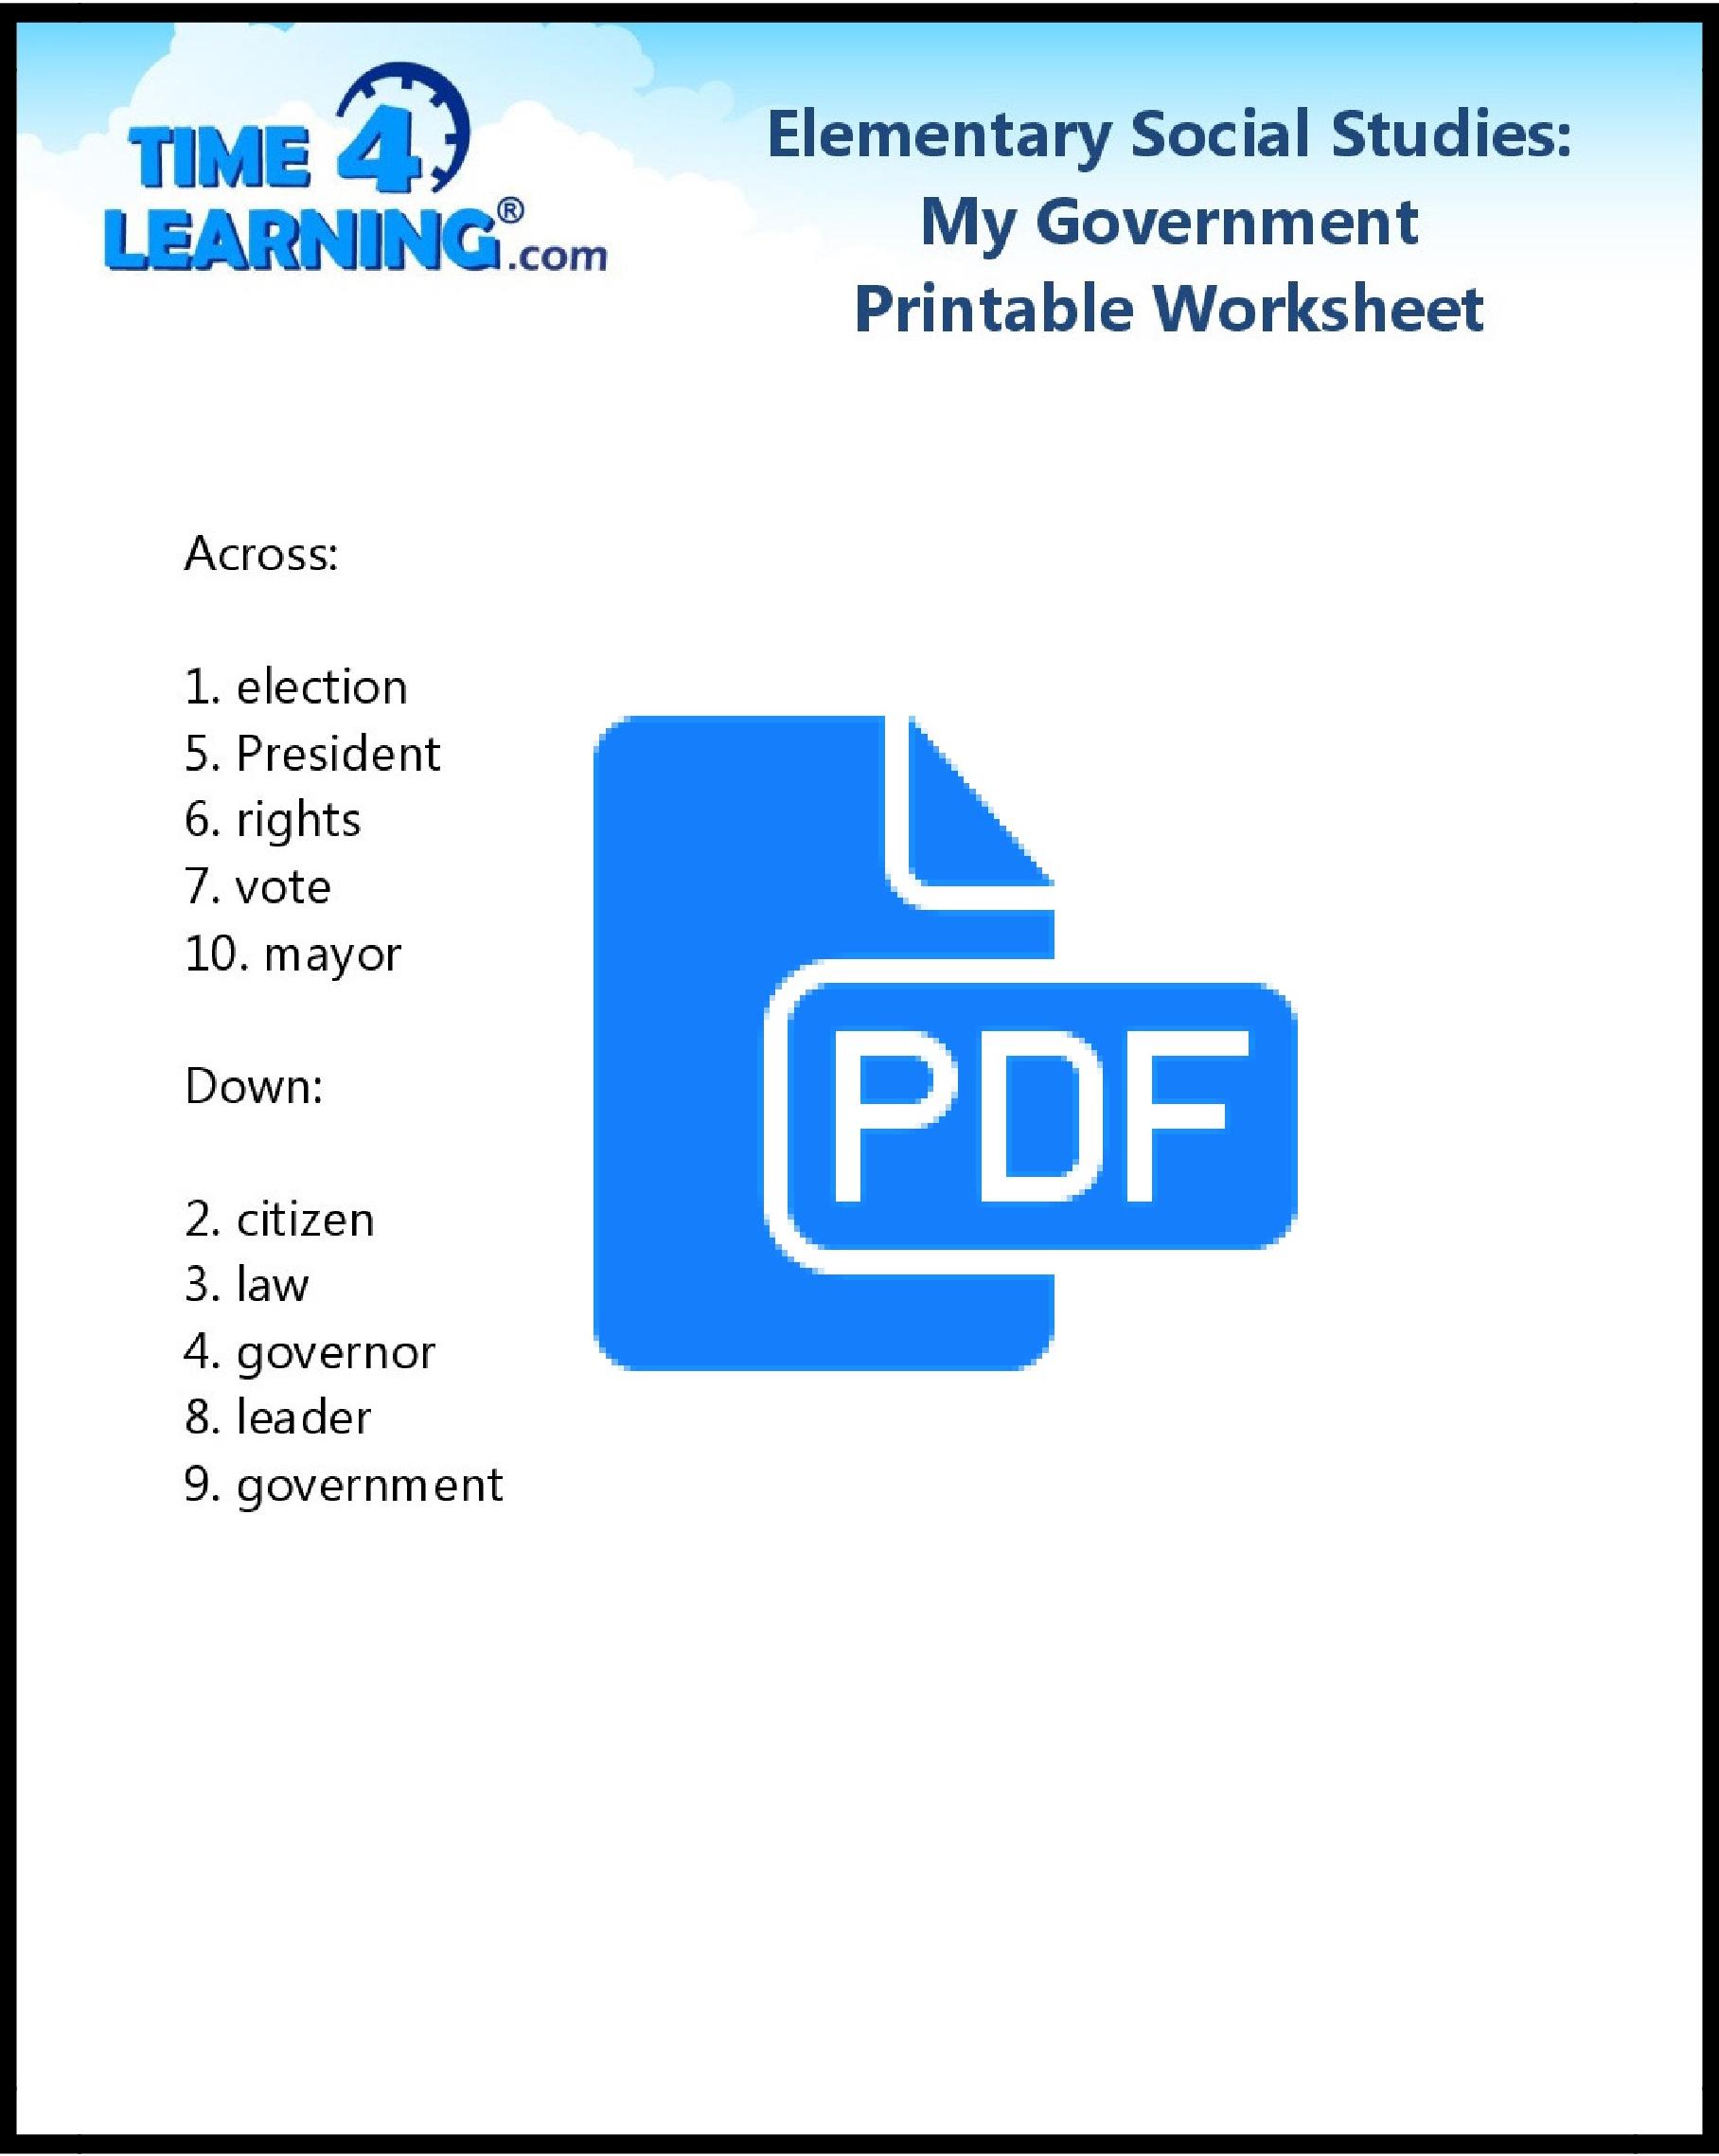 Worksheets Elementary Social Stu S Worksheets